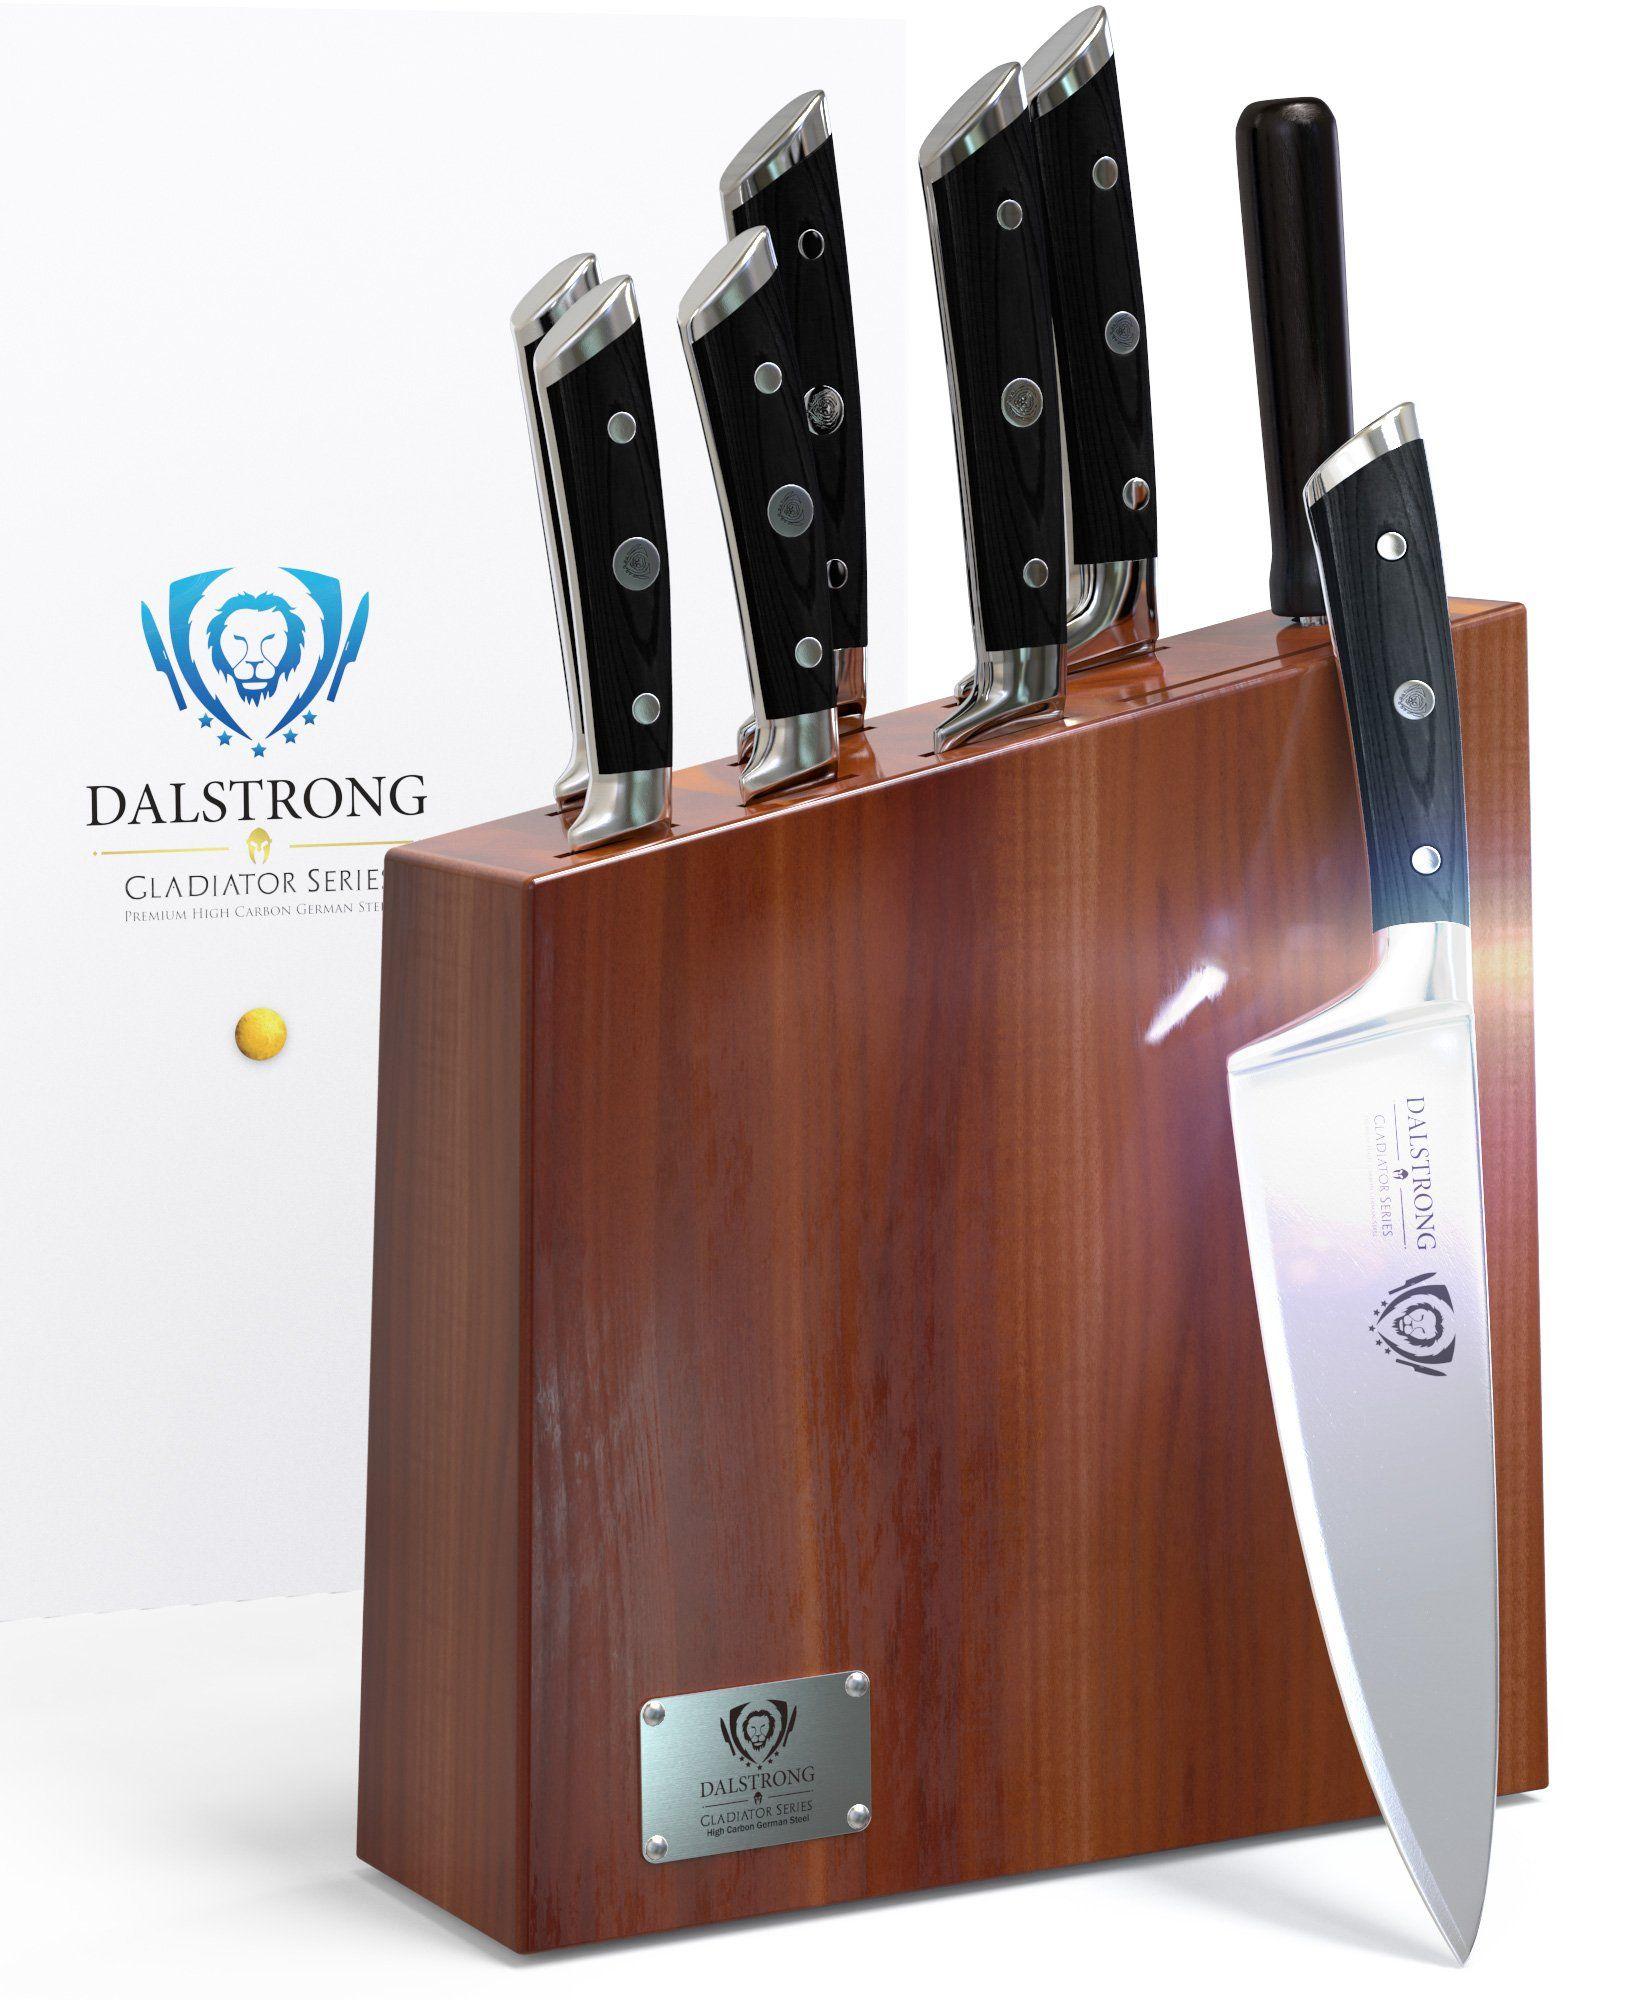 dalstrong knife set block gladiator series acacia wood block set dalstrong knife set block gladiator series acacia wood block set german hc stainless steel